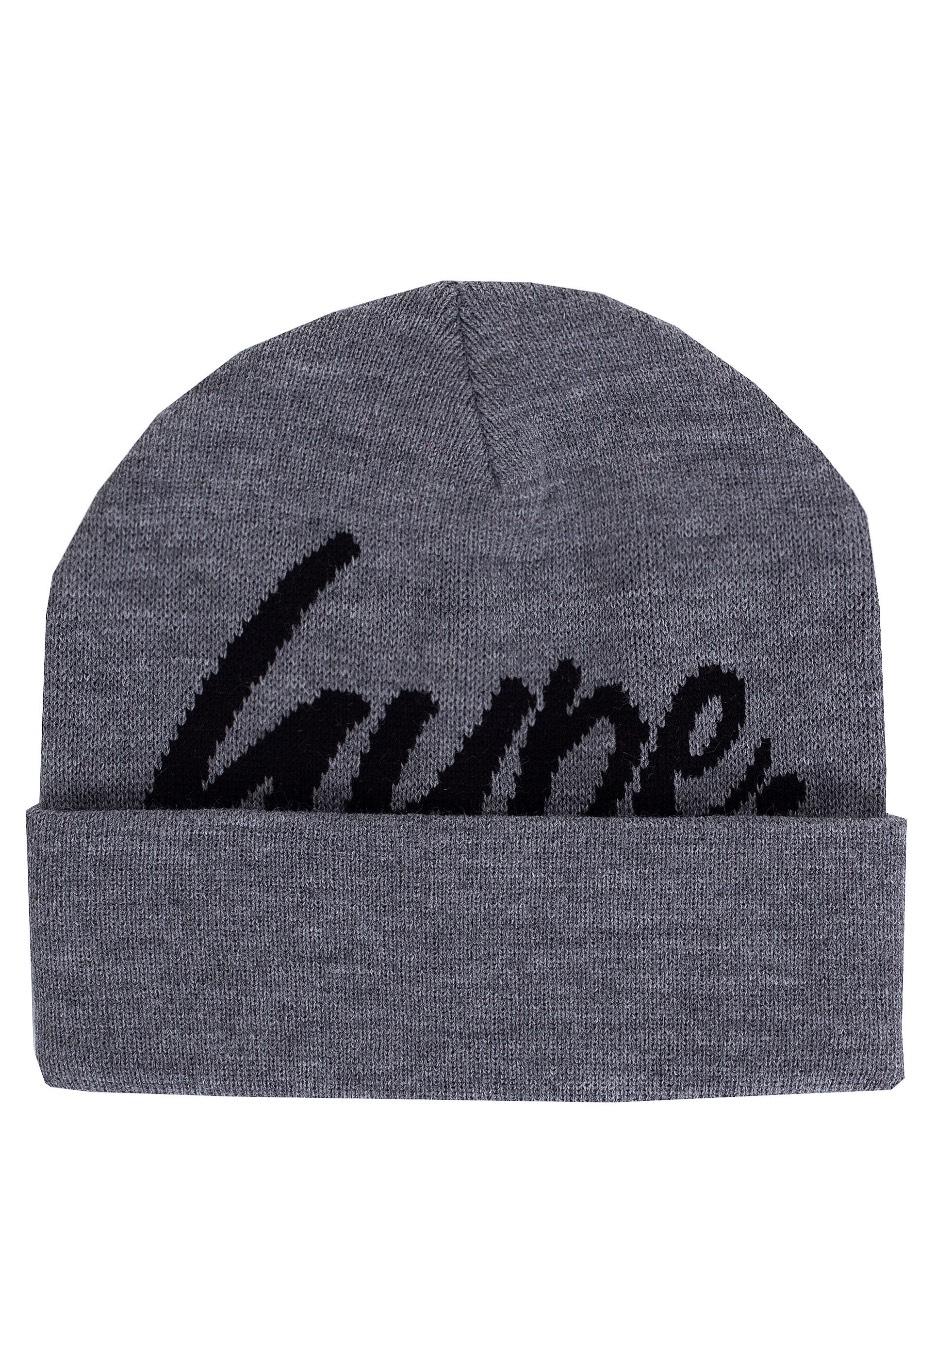 HYPE. - Half Script Grey Black - Beanie - Streetwear Shop - Impericon.com UK 5a84b7314be